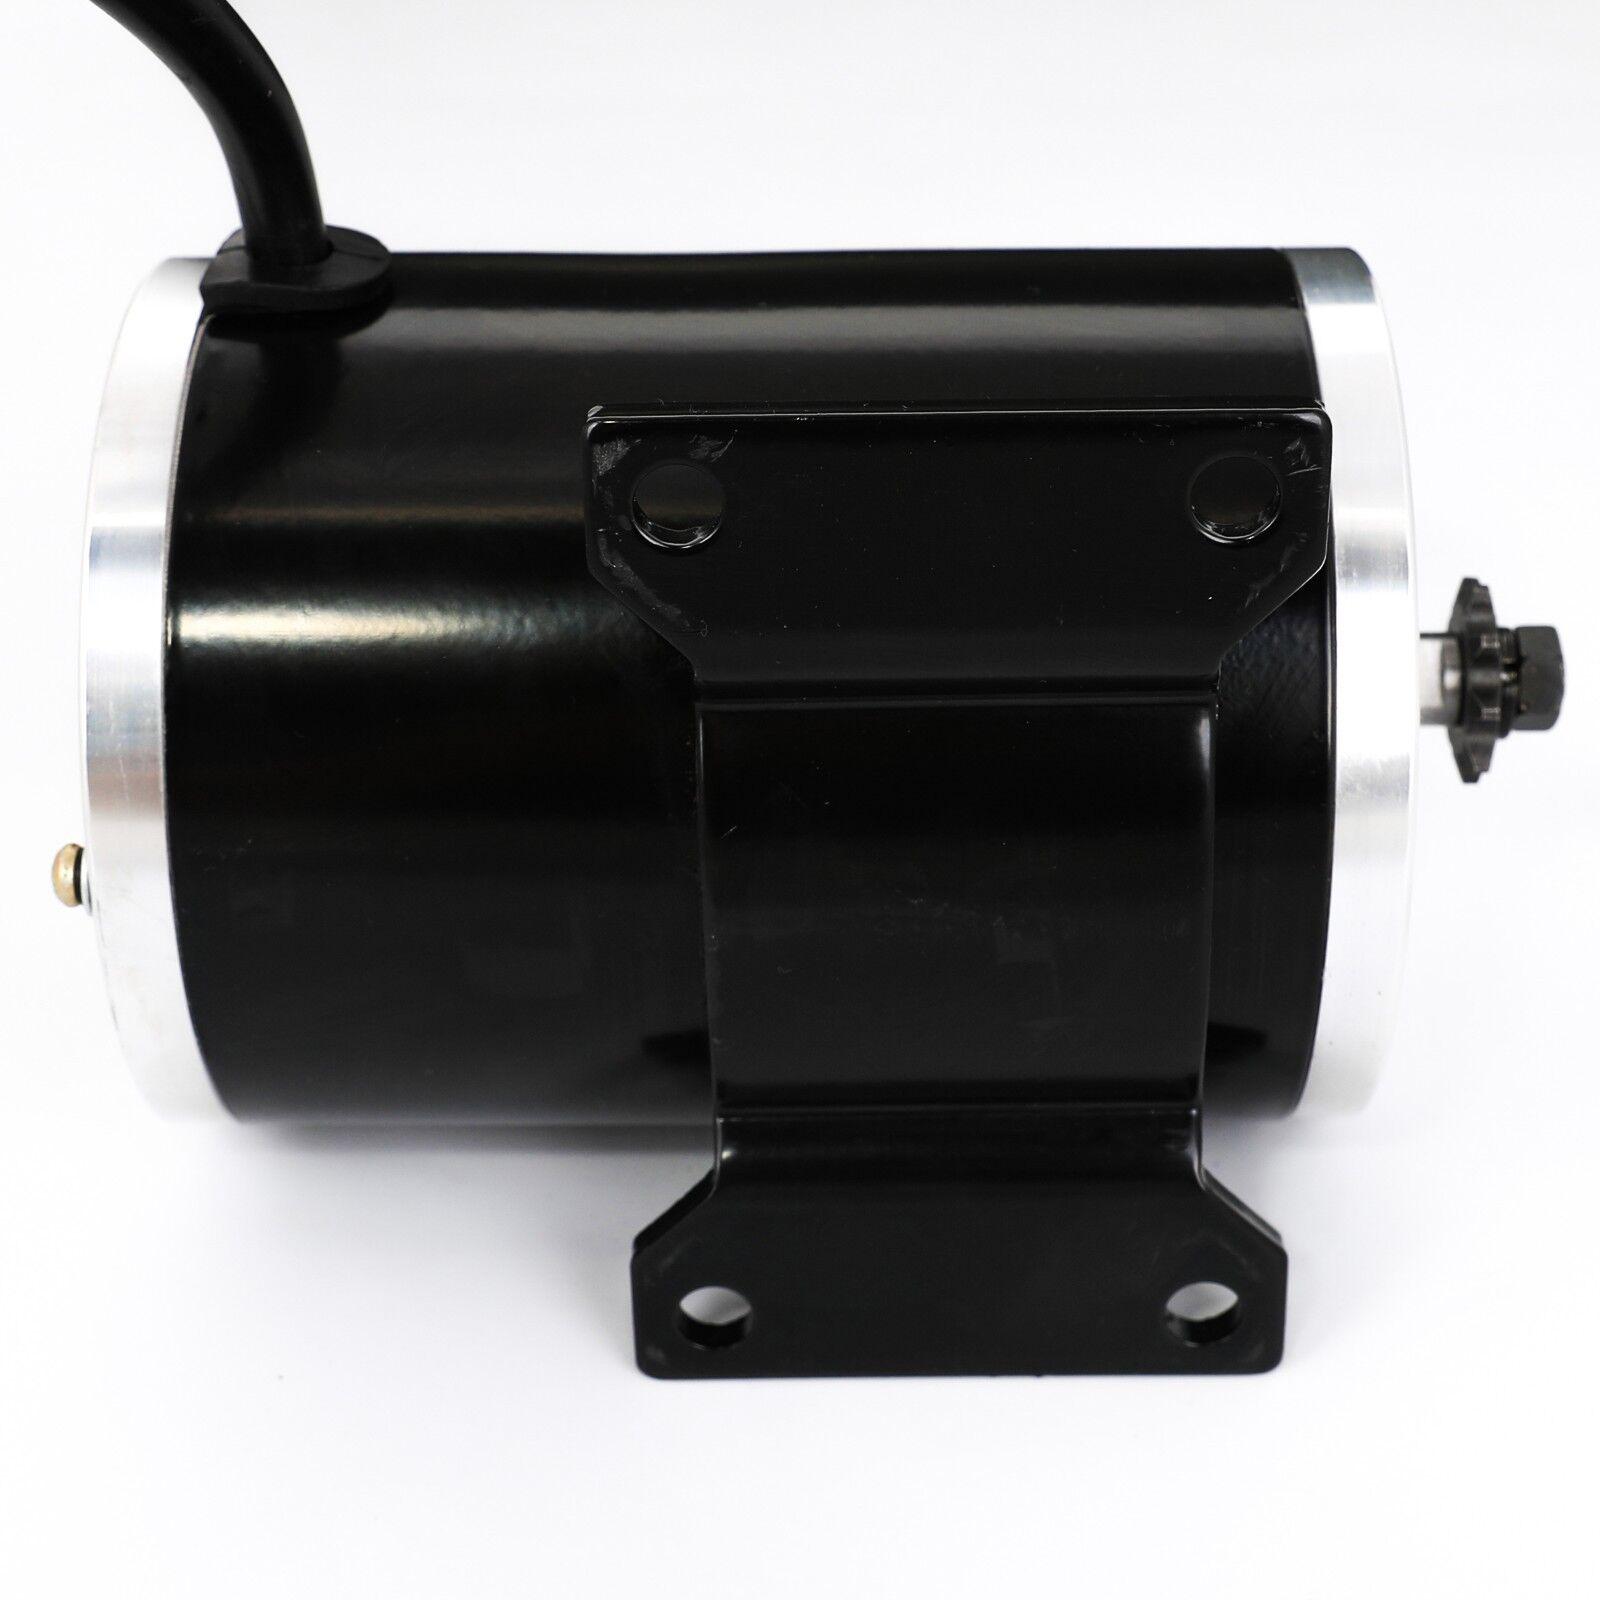 1800 W 48 V Motor sin escobillas escobillas escobillas DC E-Controlador de Velocidad Acelerador Agarre Alambre Arnés Ebike fd3d65